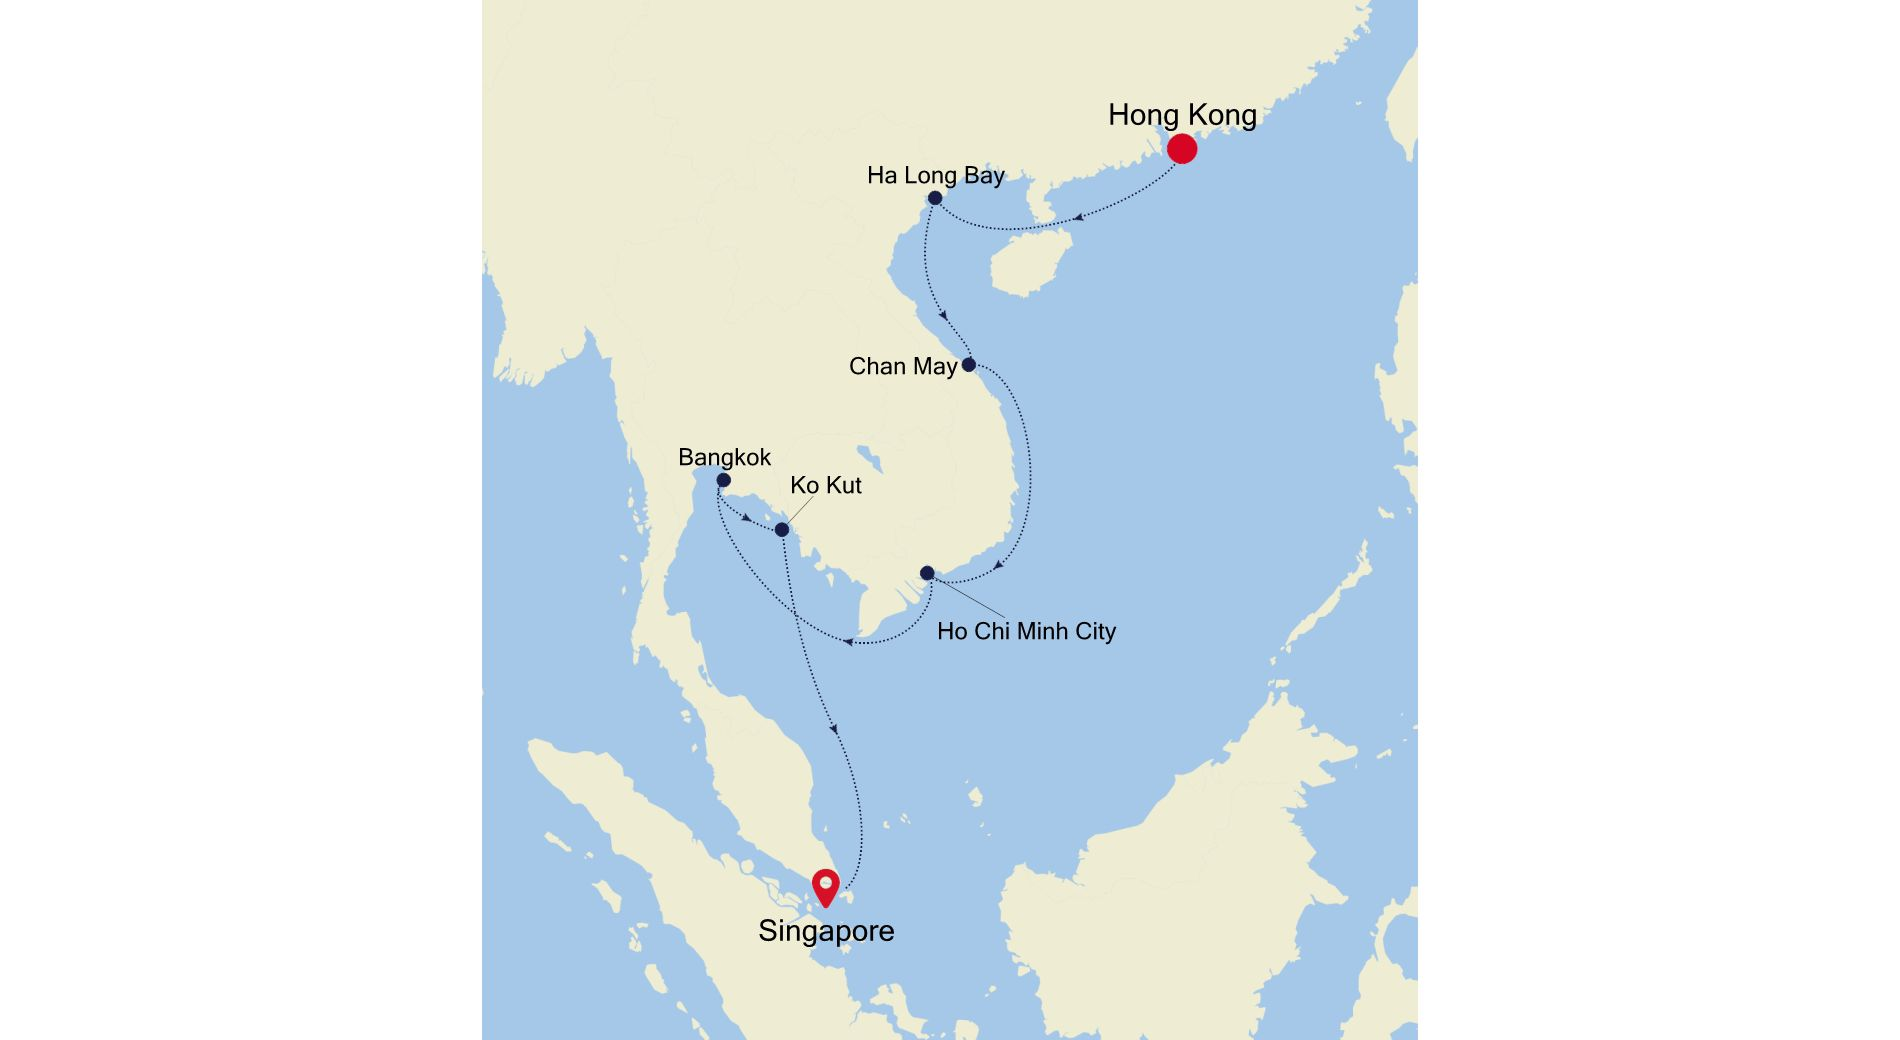 MO220131014 - Hong Kong a Singapore